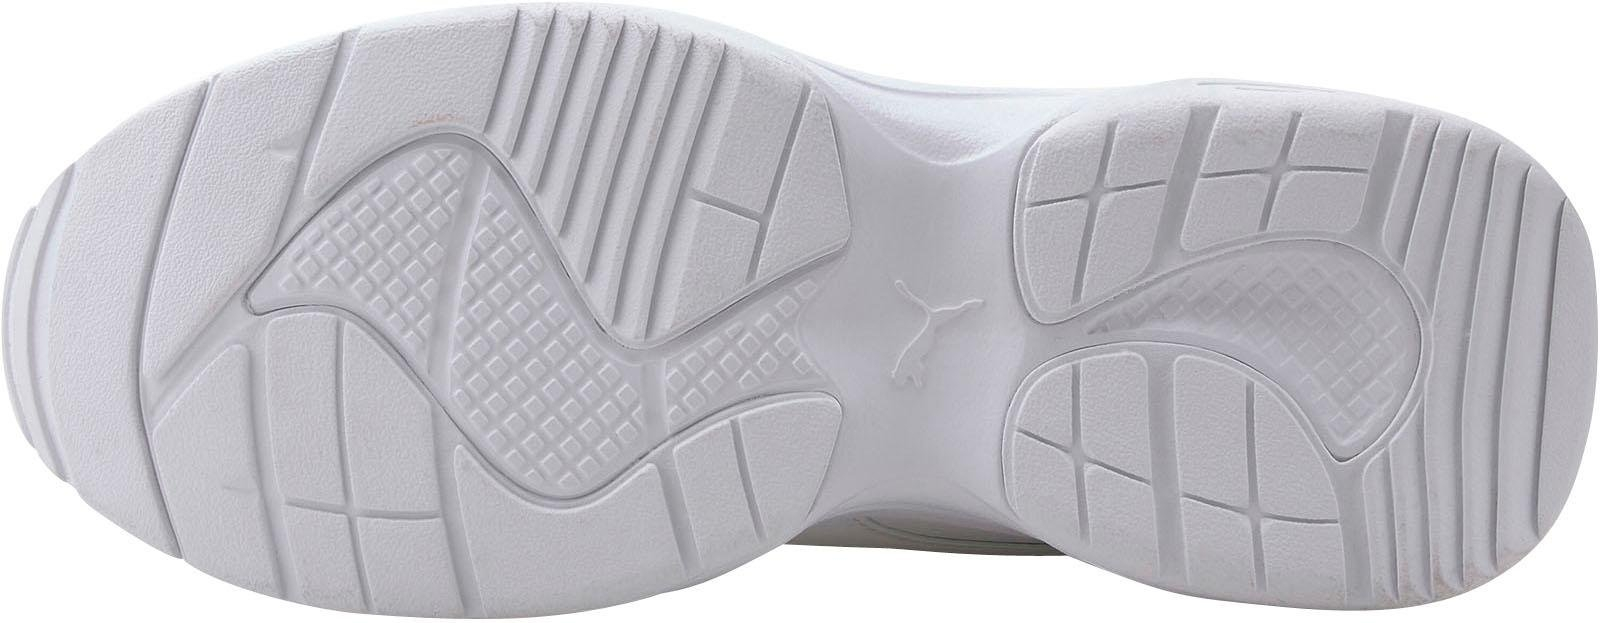 PUMA sneakers »Cilia Mode« nu online bestellen